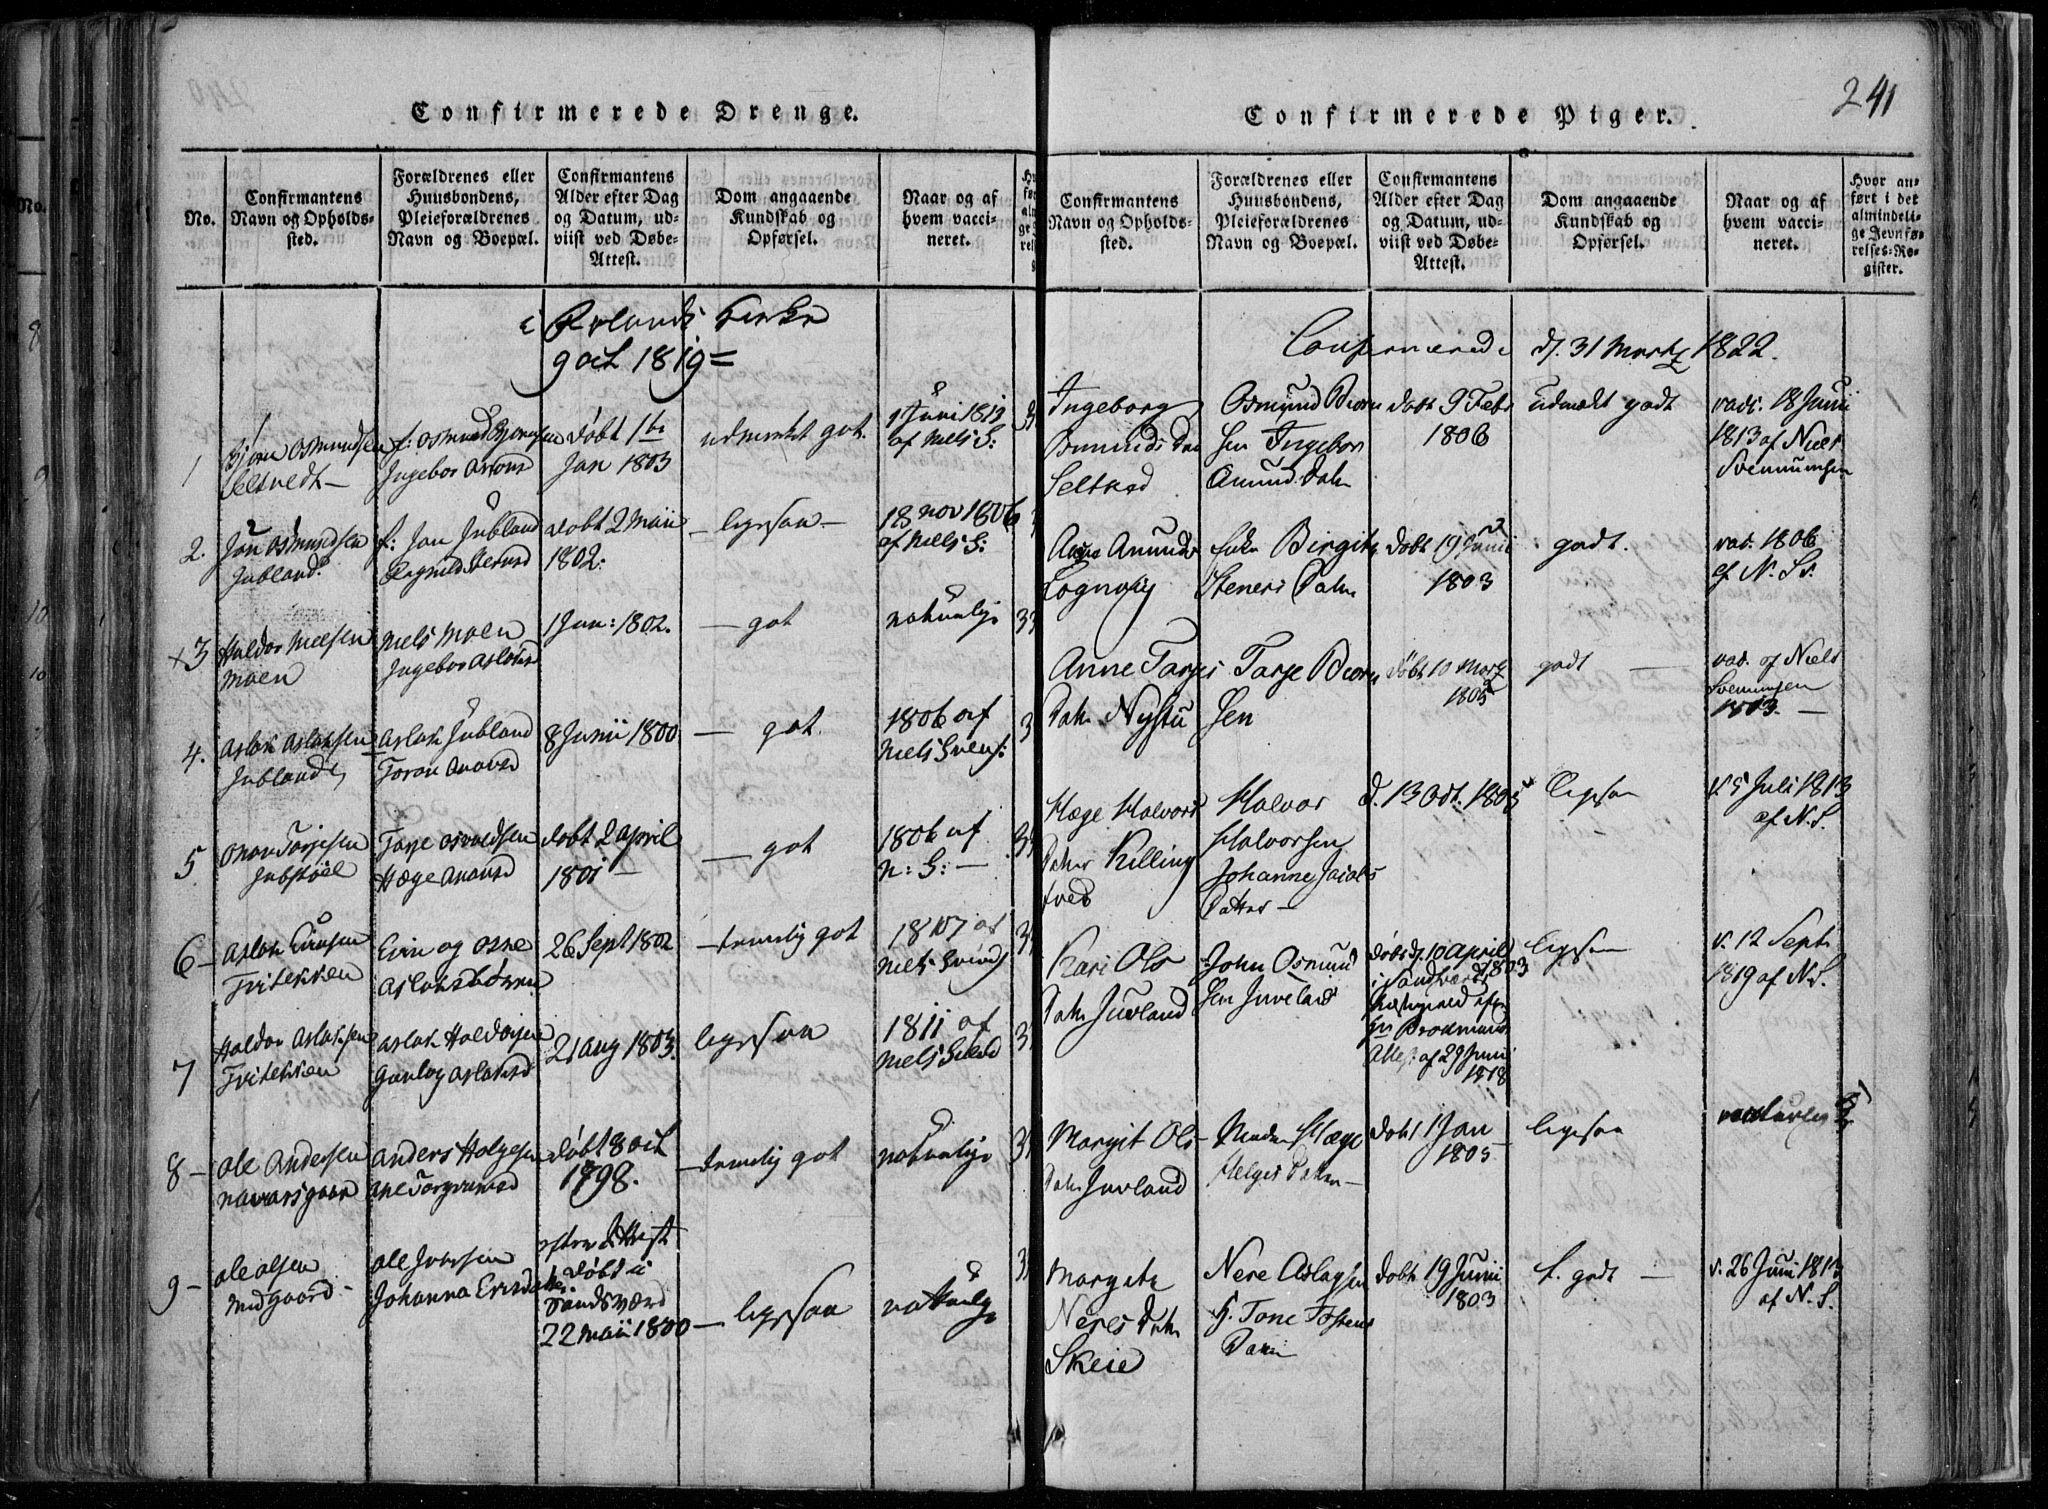 SAKO, Rauland kirkebøker, F/Fa/L0001: Ministerialbok nr. 1, 1814-1859, s. 241